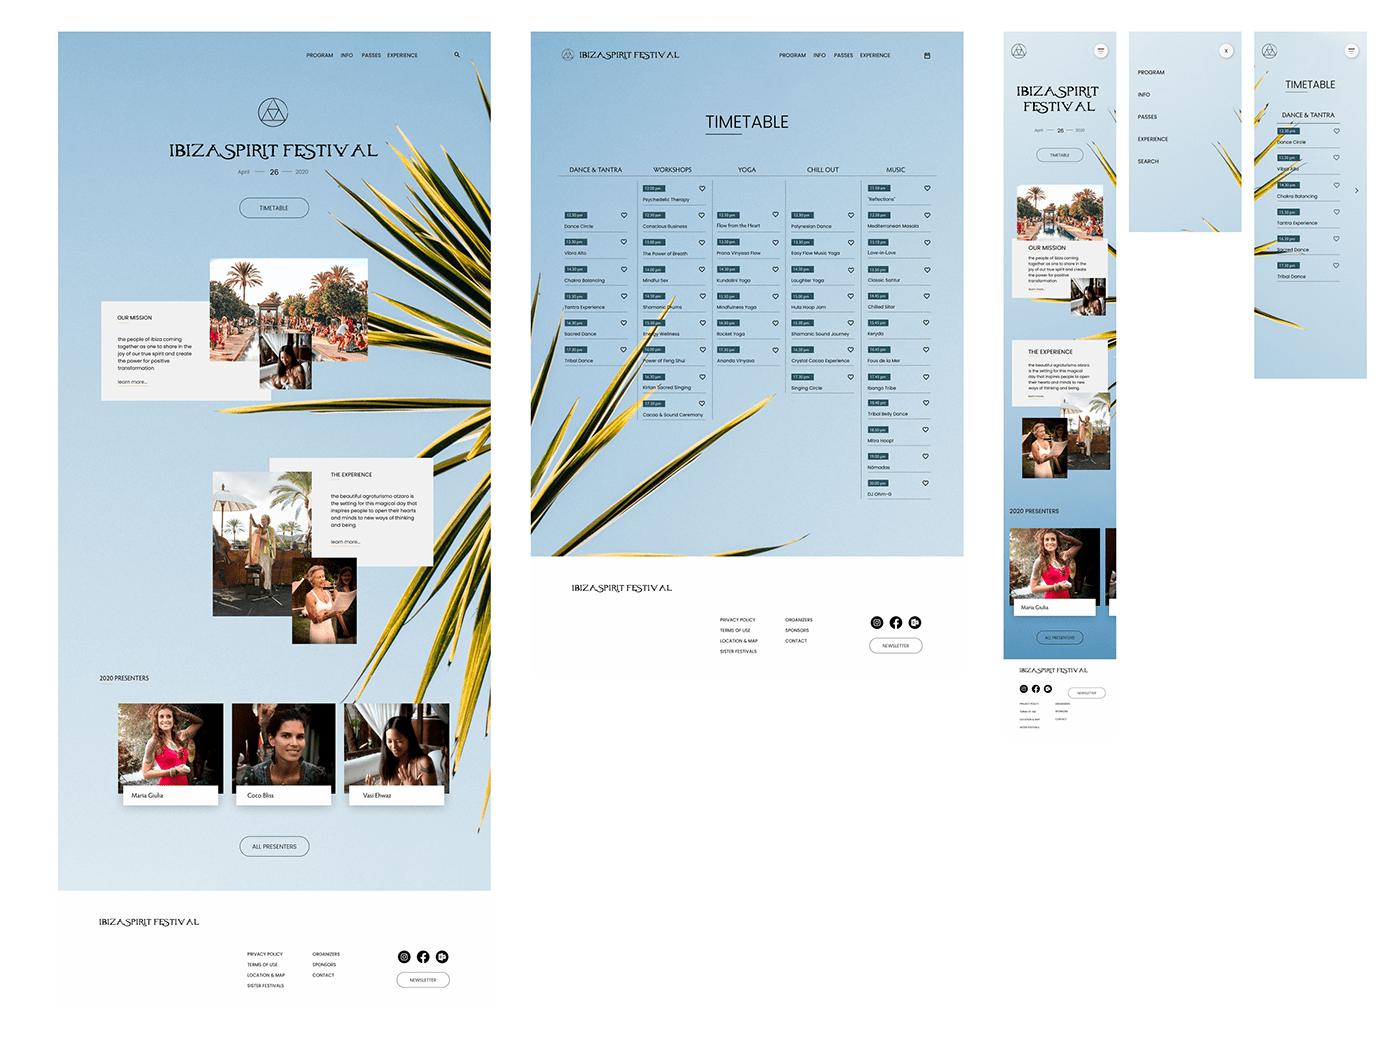 UI ux uidesign redesign Webdesign UserExperience UserInterfaceDesign